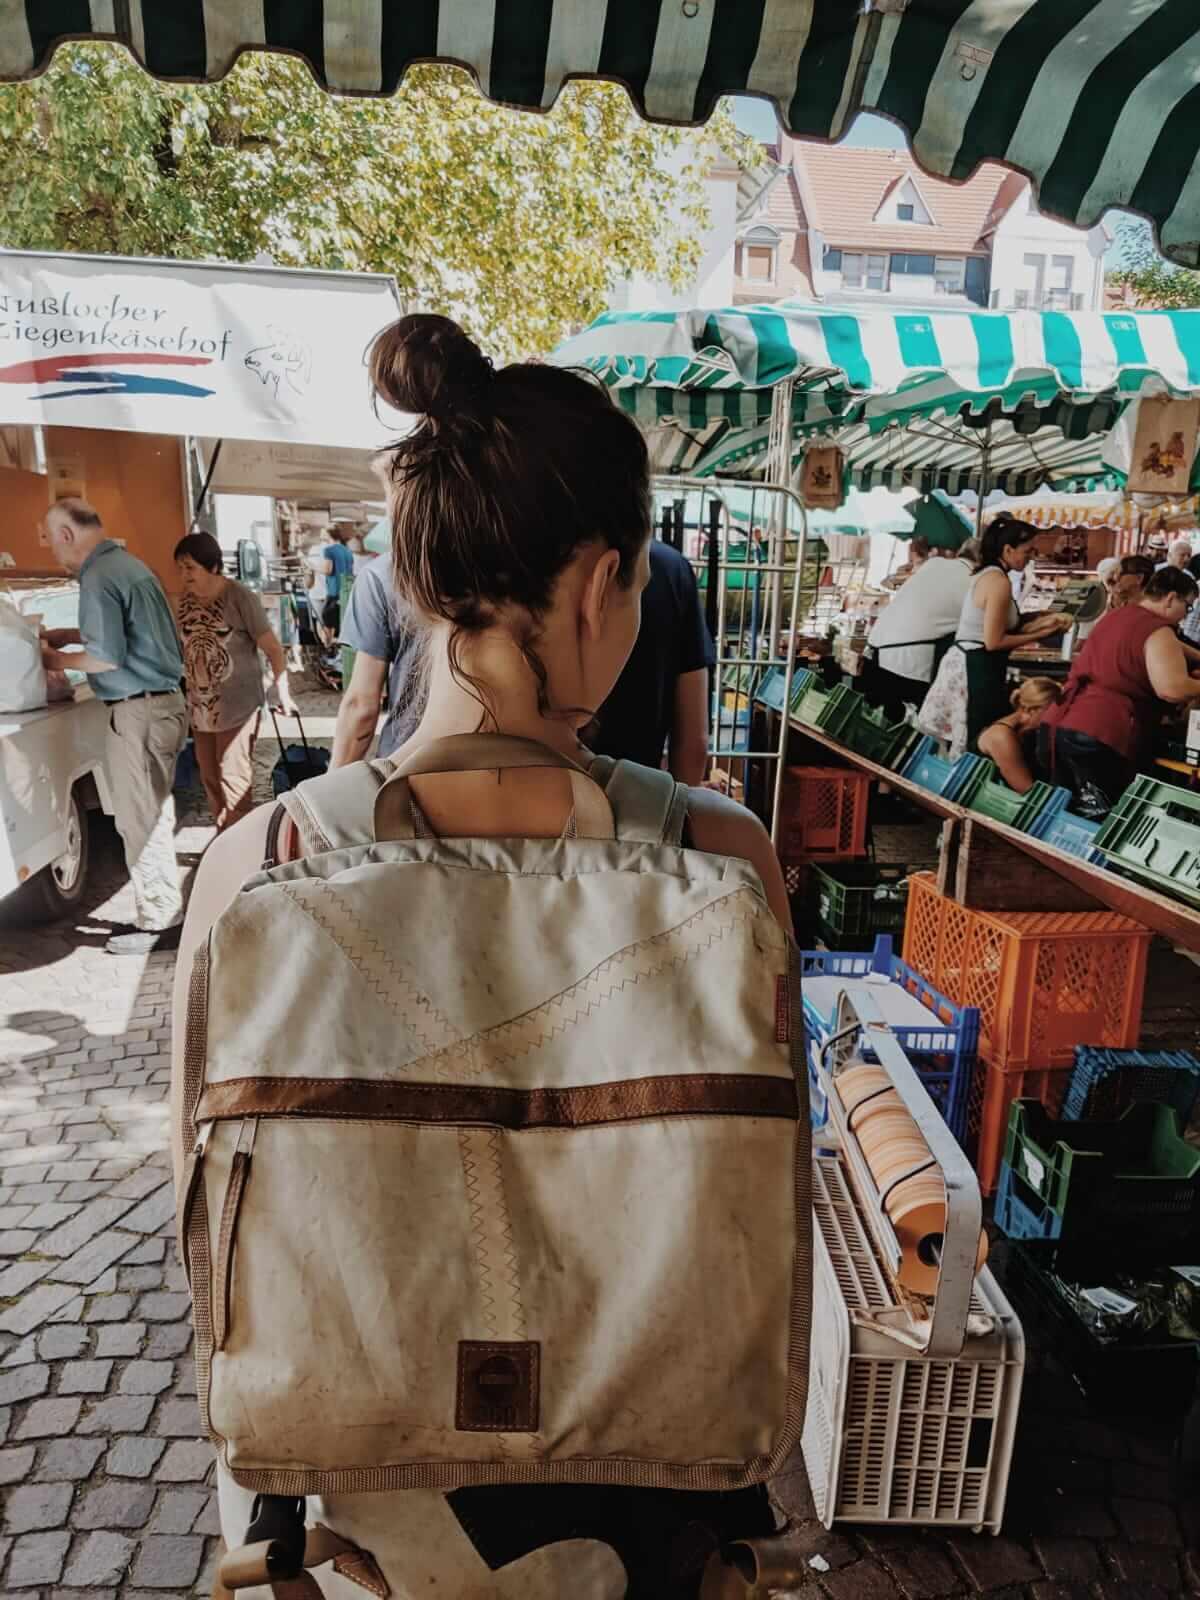 vanlife-neuenheimer-markt.jpeg